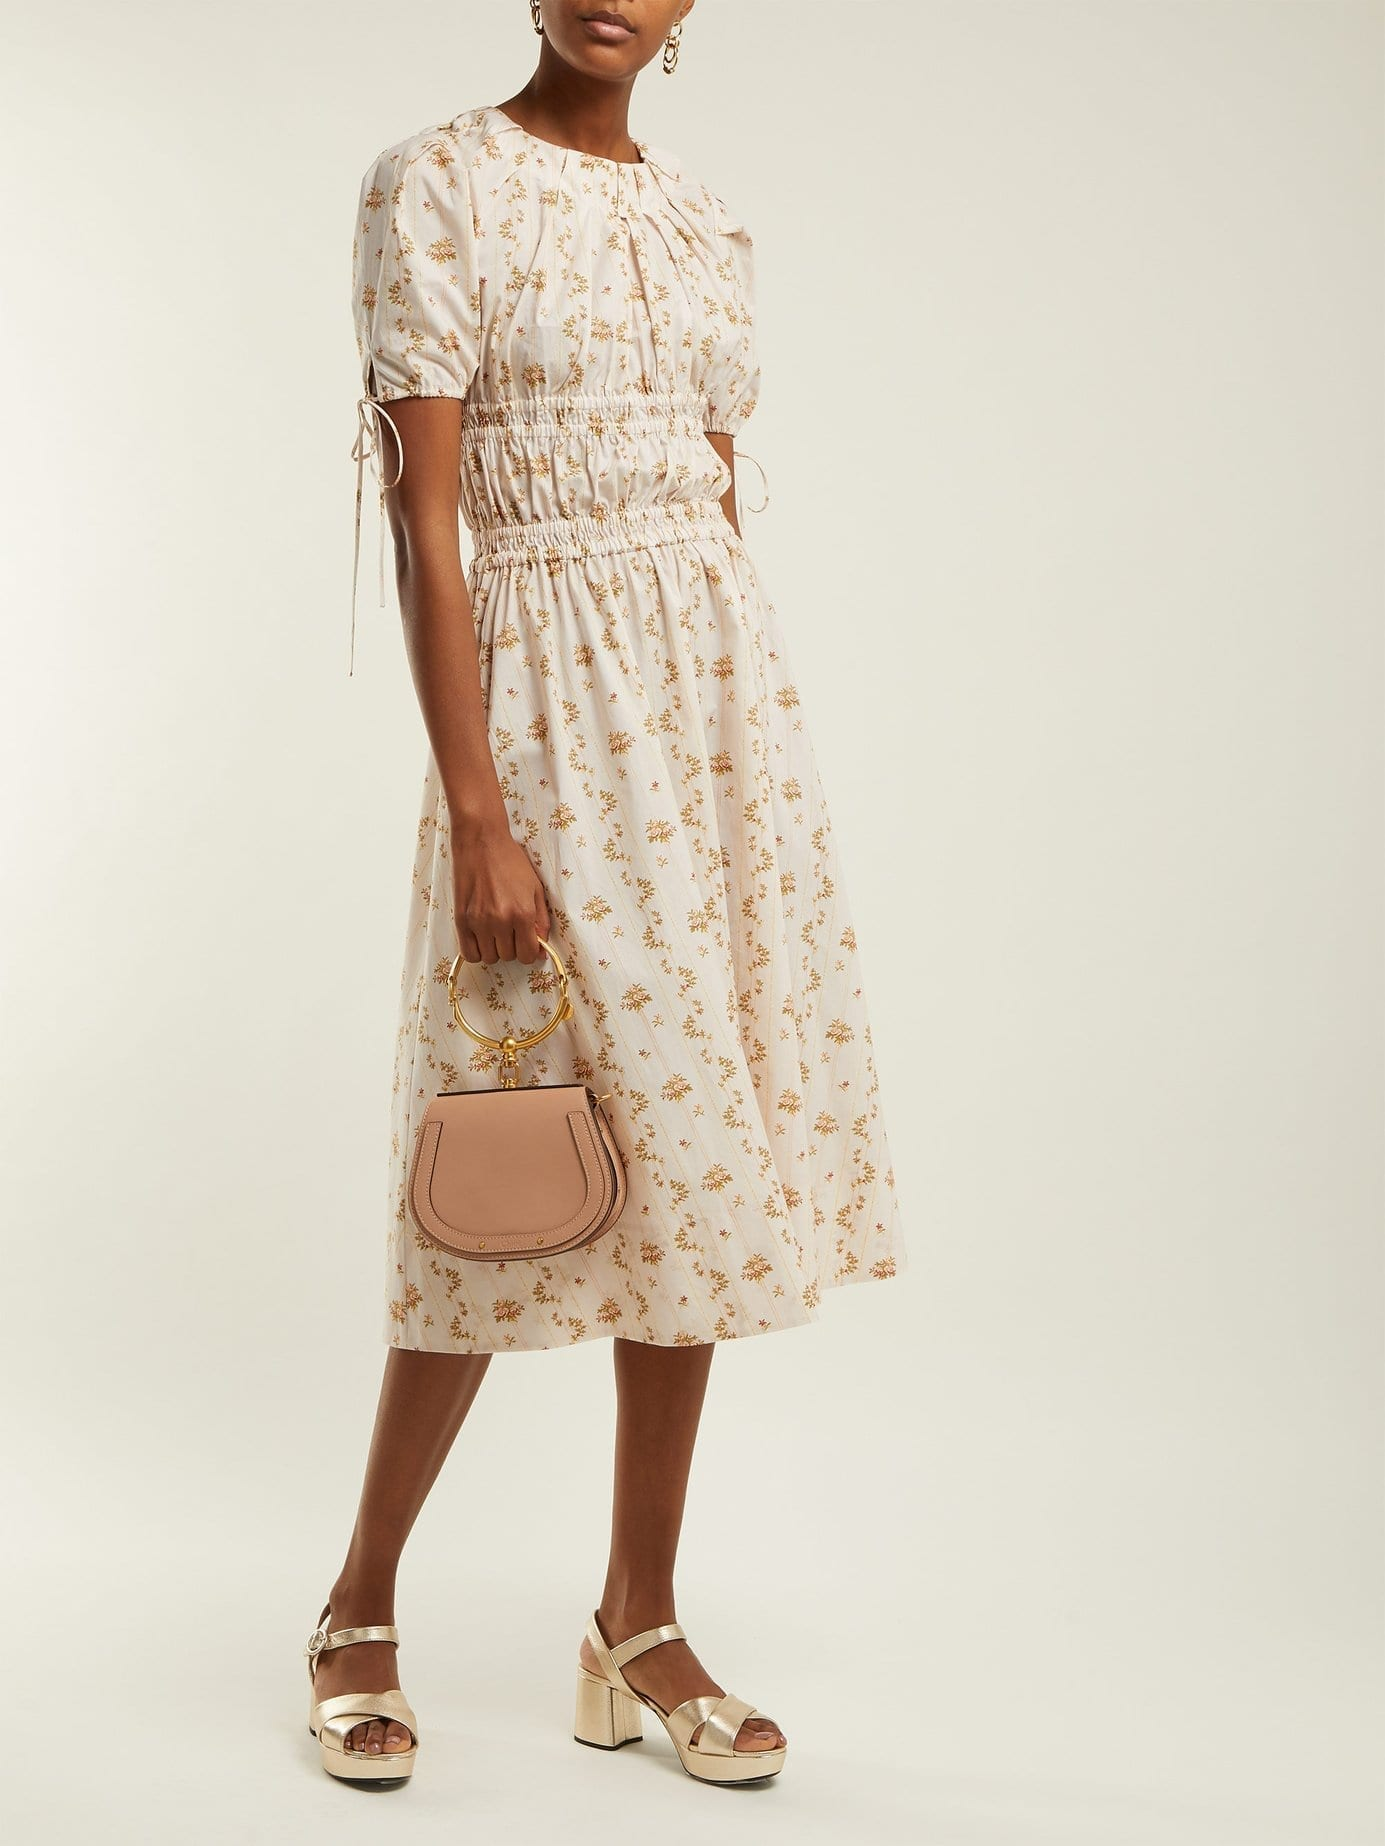 BROCK COLLECTION Orsolina Striped Floral-Print Cotton Midi Cream Dress